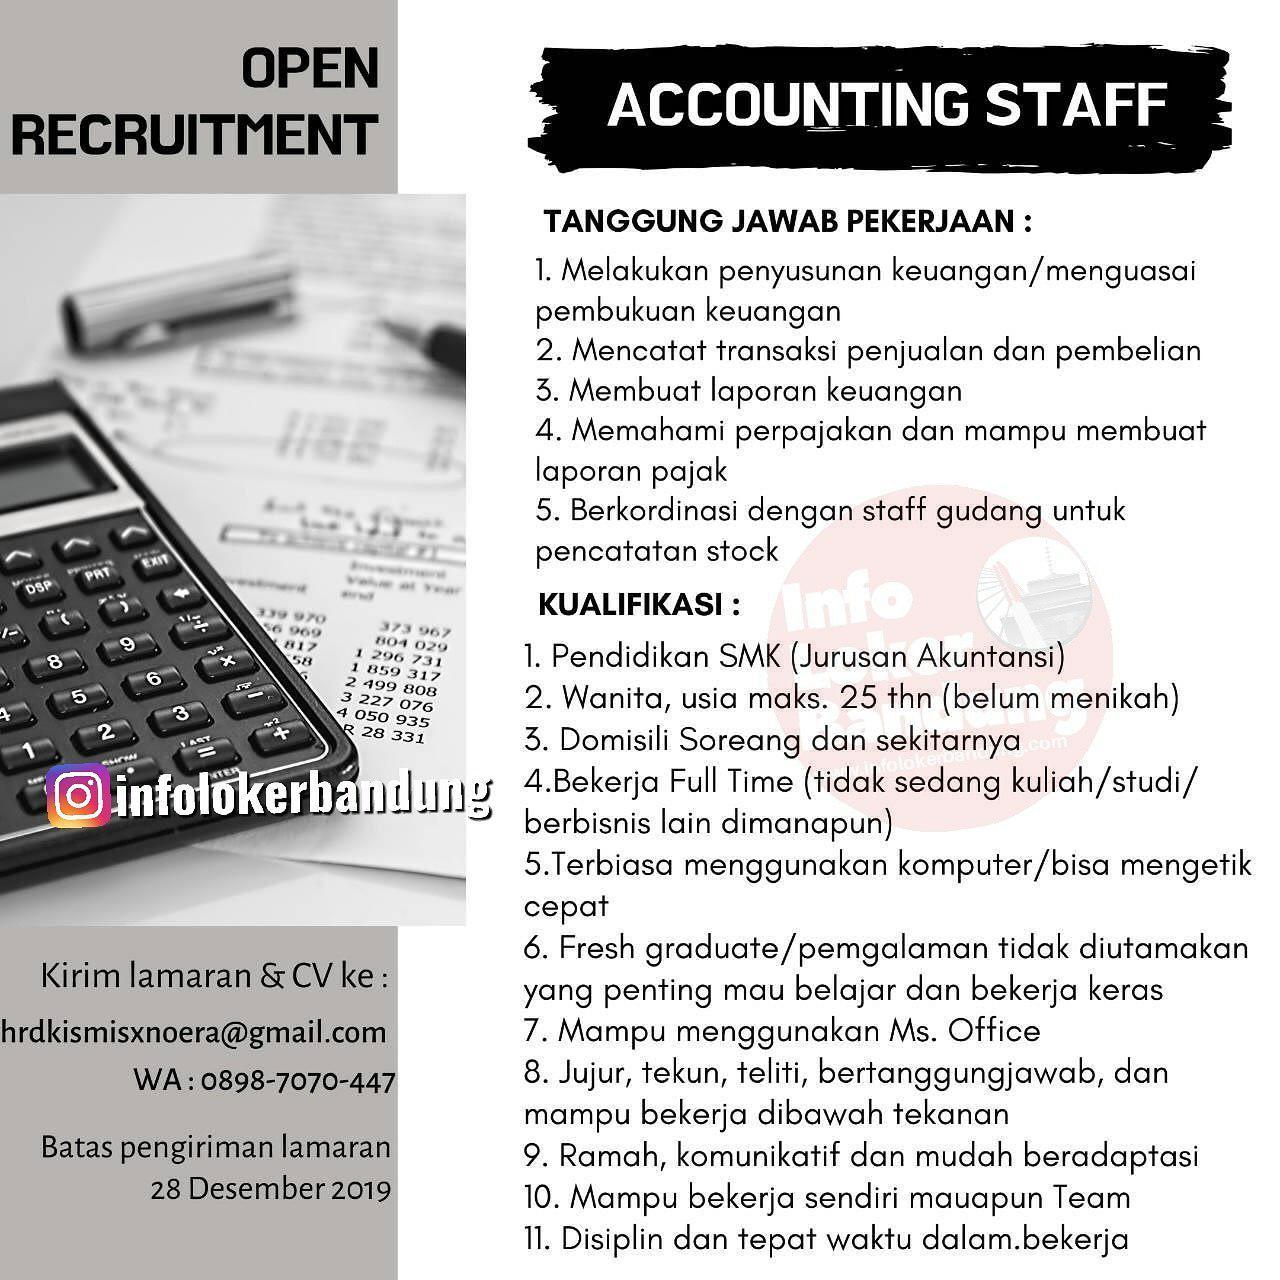 Lowongan Kerja Accounting Staff Noera X Kismis Bandung Desember 2019